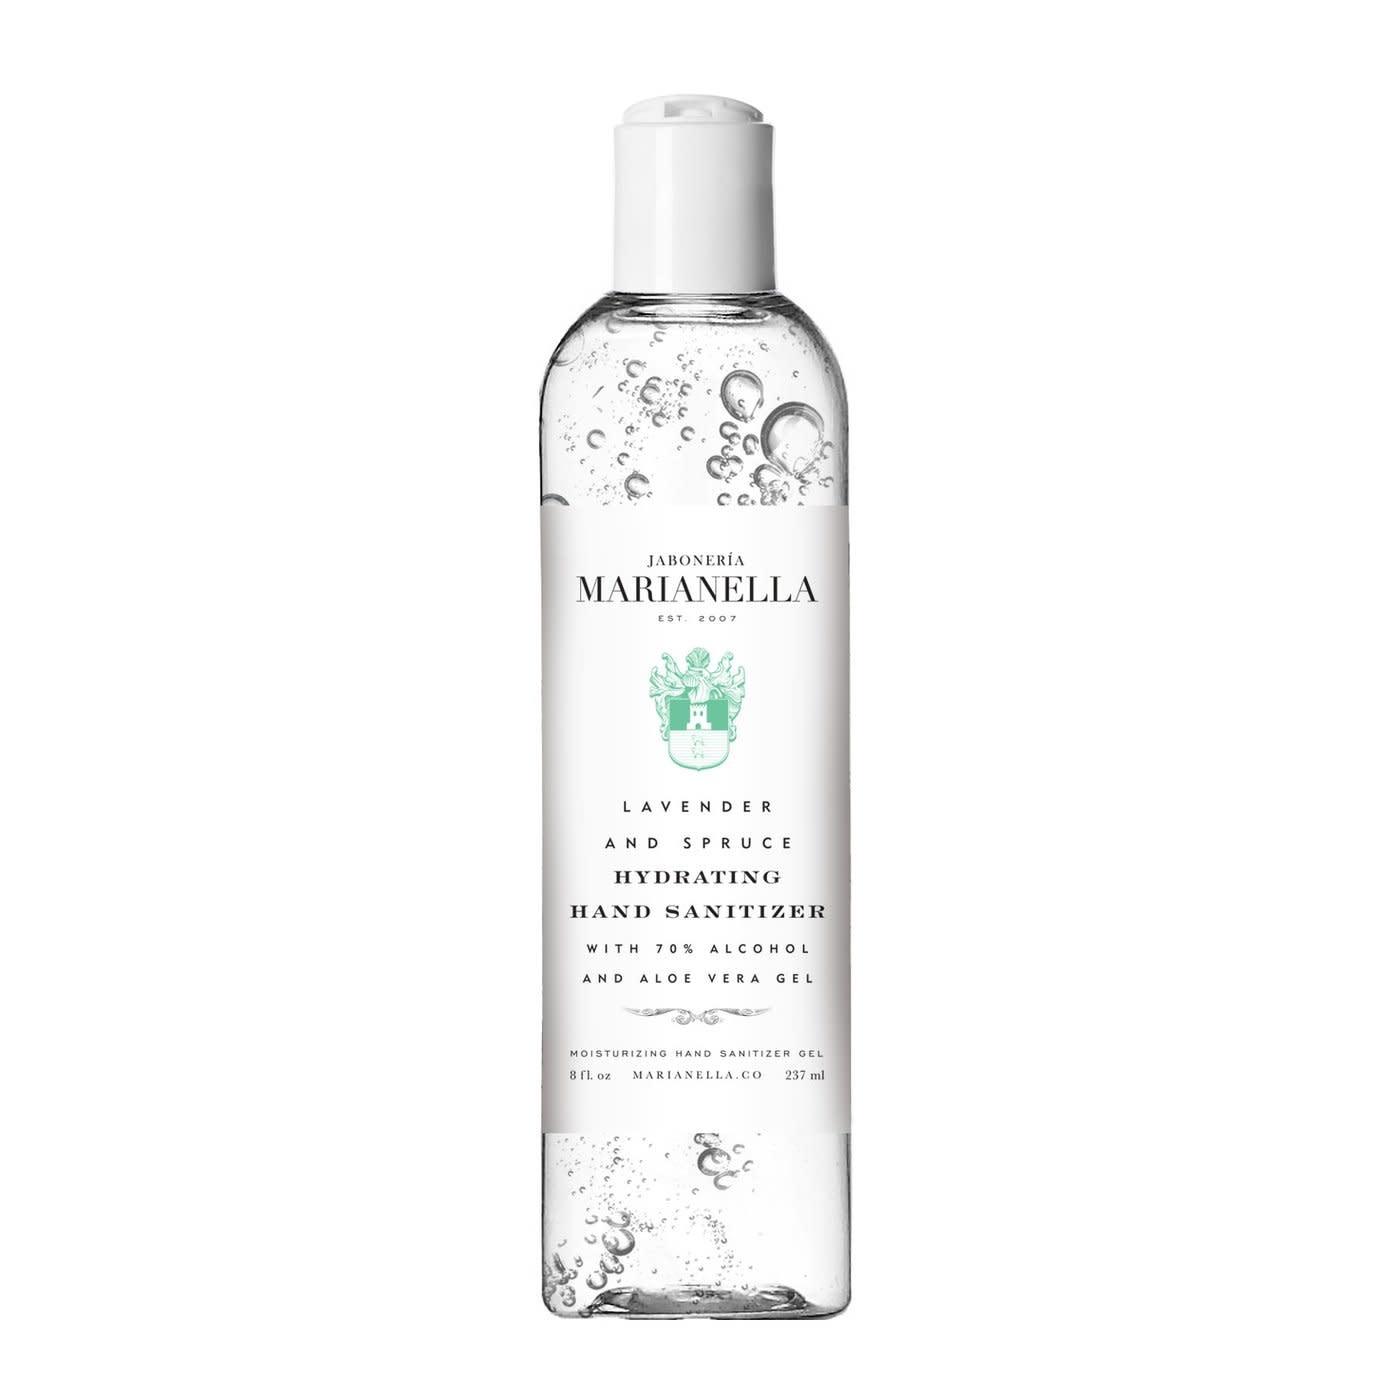 Lavender & Spruce Hydrating Aloe Hand Sanitizer